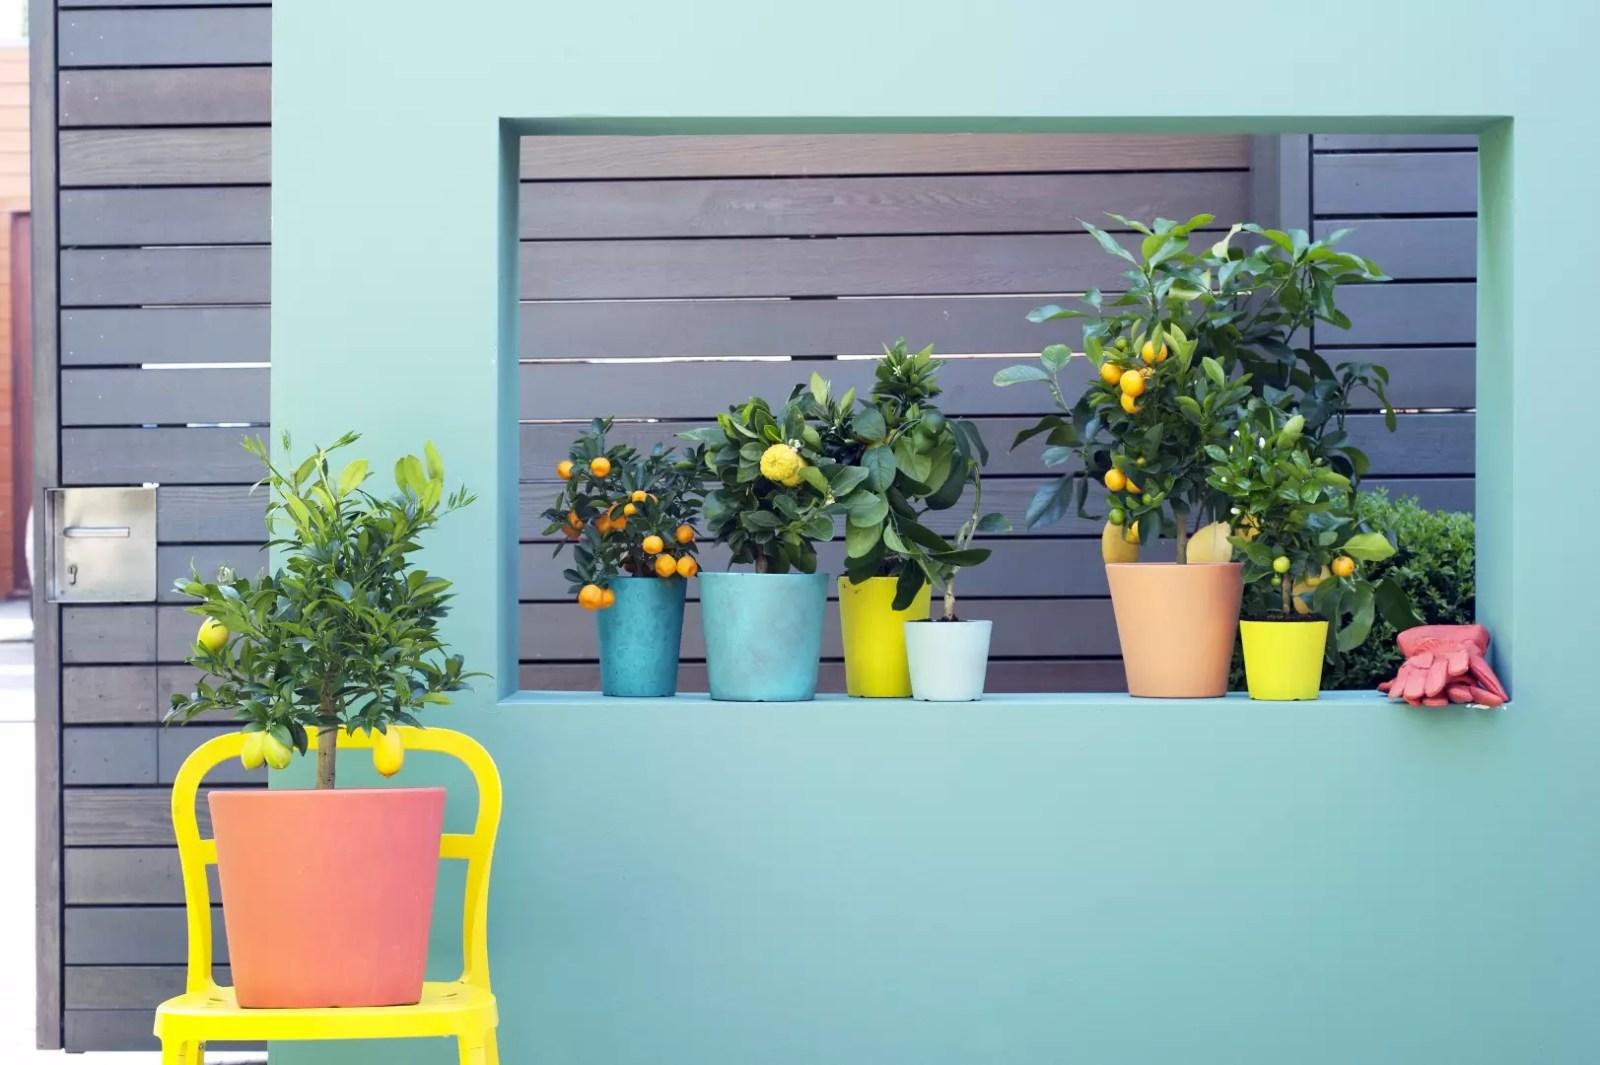 Buitenleven | Citrusboompjes = fris en fruitig - Woonblog StijlvolStyling.com